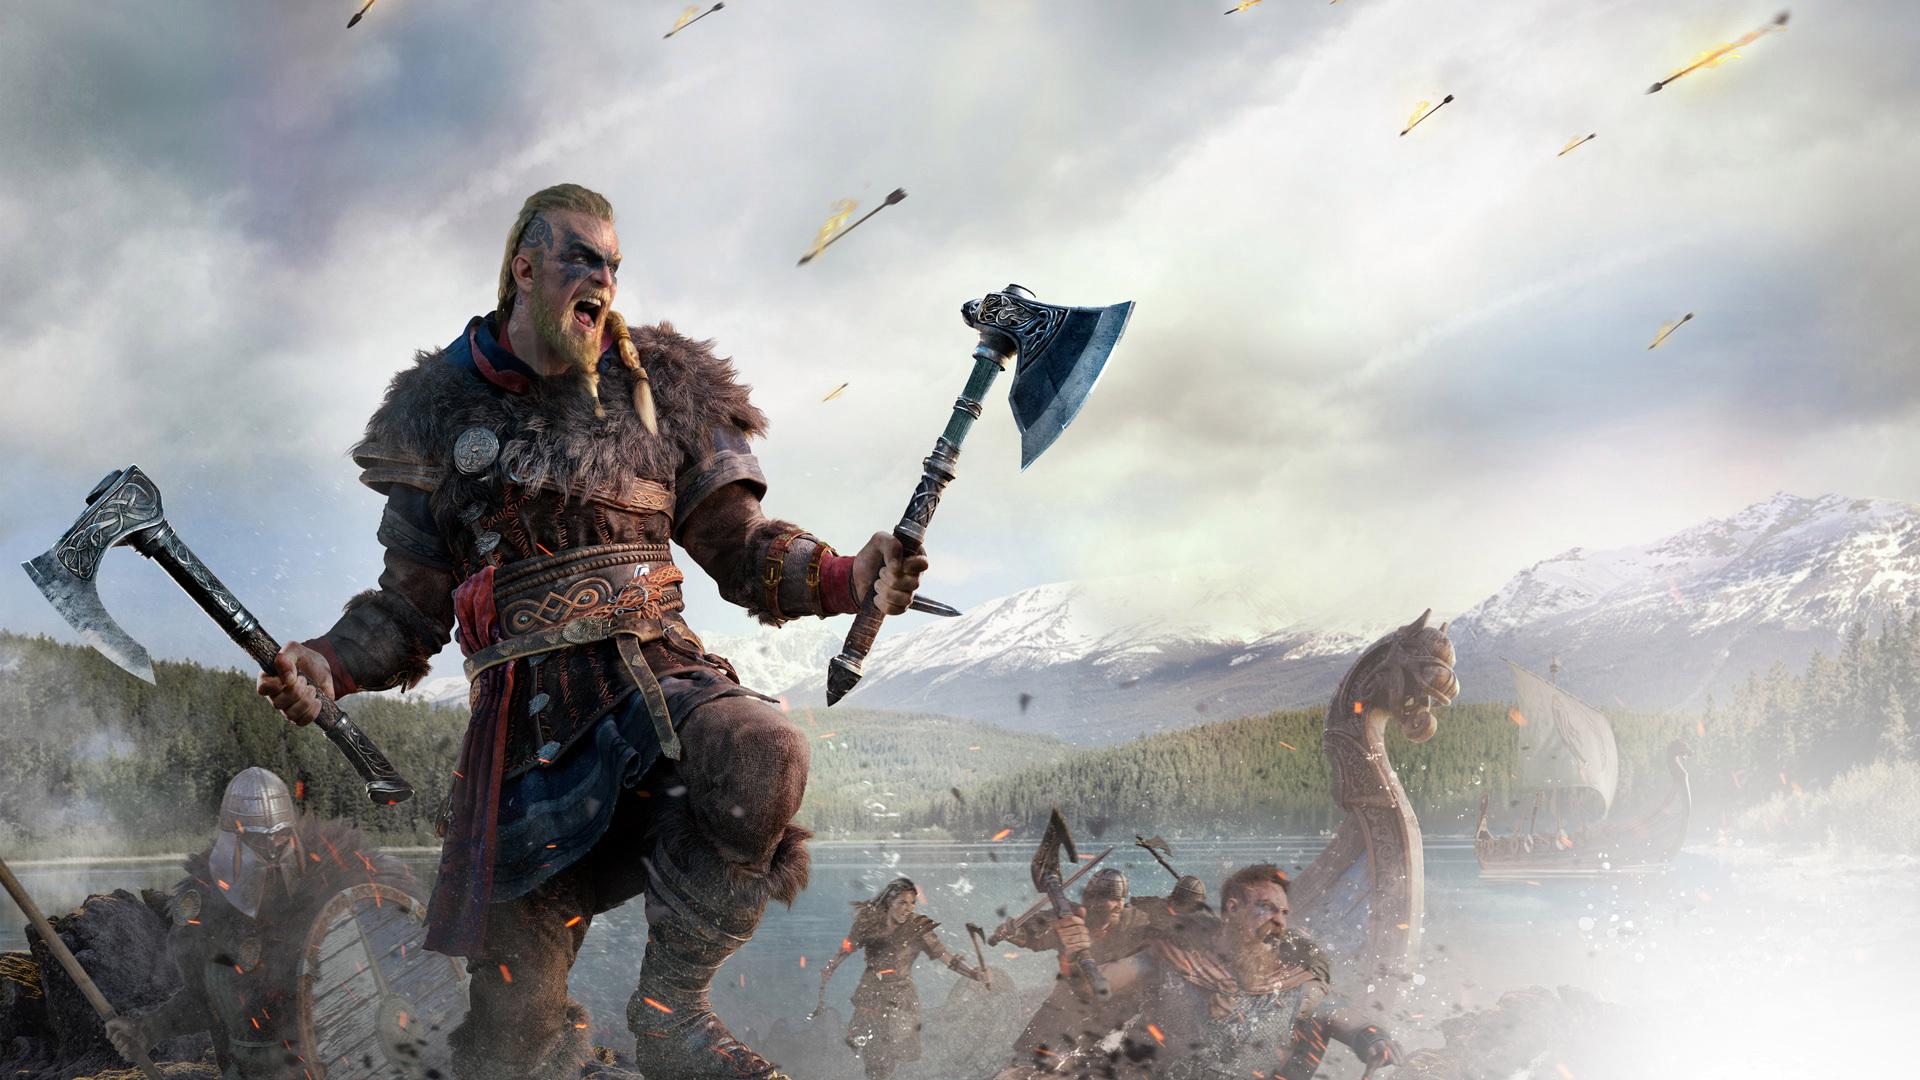 https://www.amazon.com/Assassins-Creed-Valhalla-PlayStation-4-Standard/dp/B087XR383W/ref=as_li_ss_tl?crid=76FJXJ67O5G1&dchild=1&keywords=assassin's+creed+valhalla&qid=1601941996&sprefix=assassin's+creed,aps,214&sr=8-1&th=1&linkCode=ll1&tag=corexbox-20&linkId=ed80da6cf8bf0799bd2715f6852d1537&language=en_US